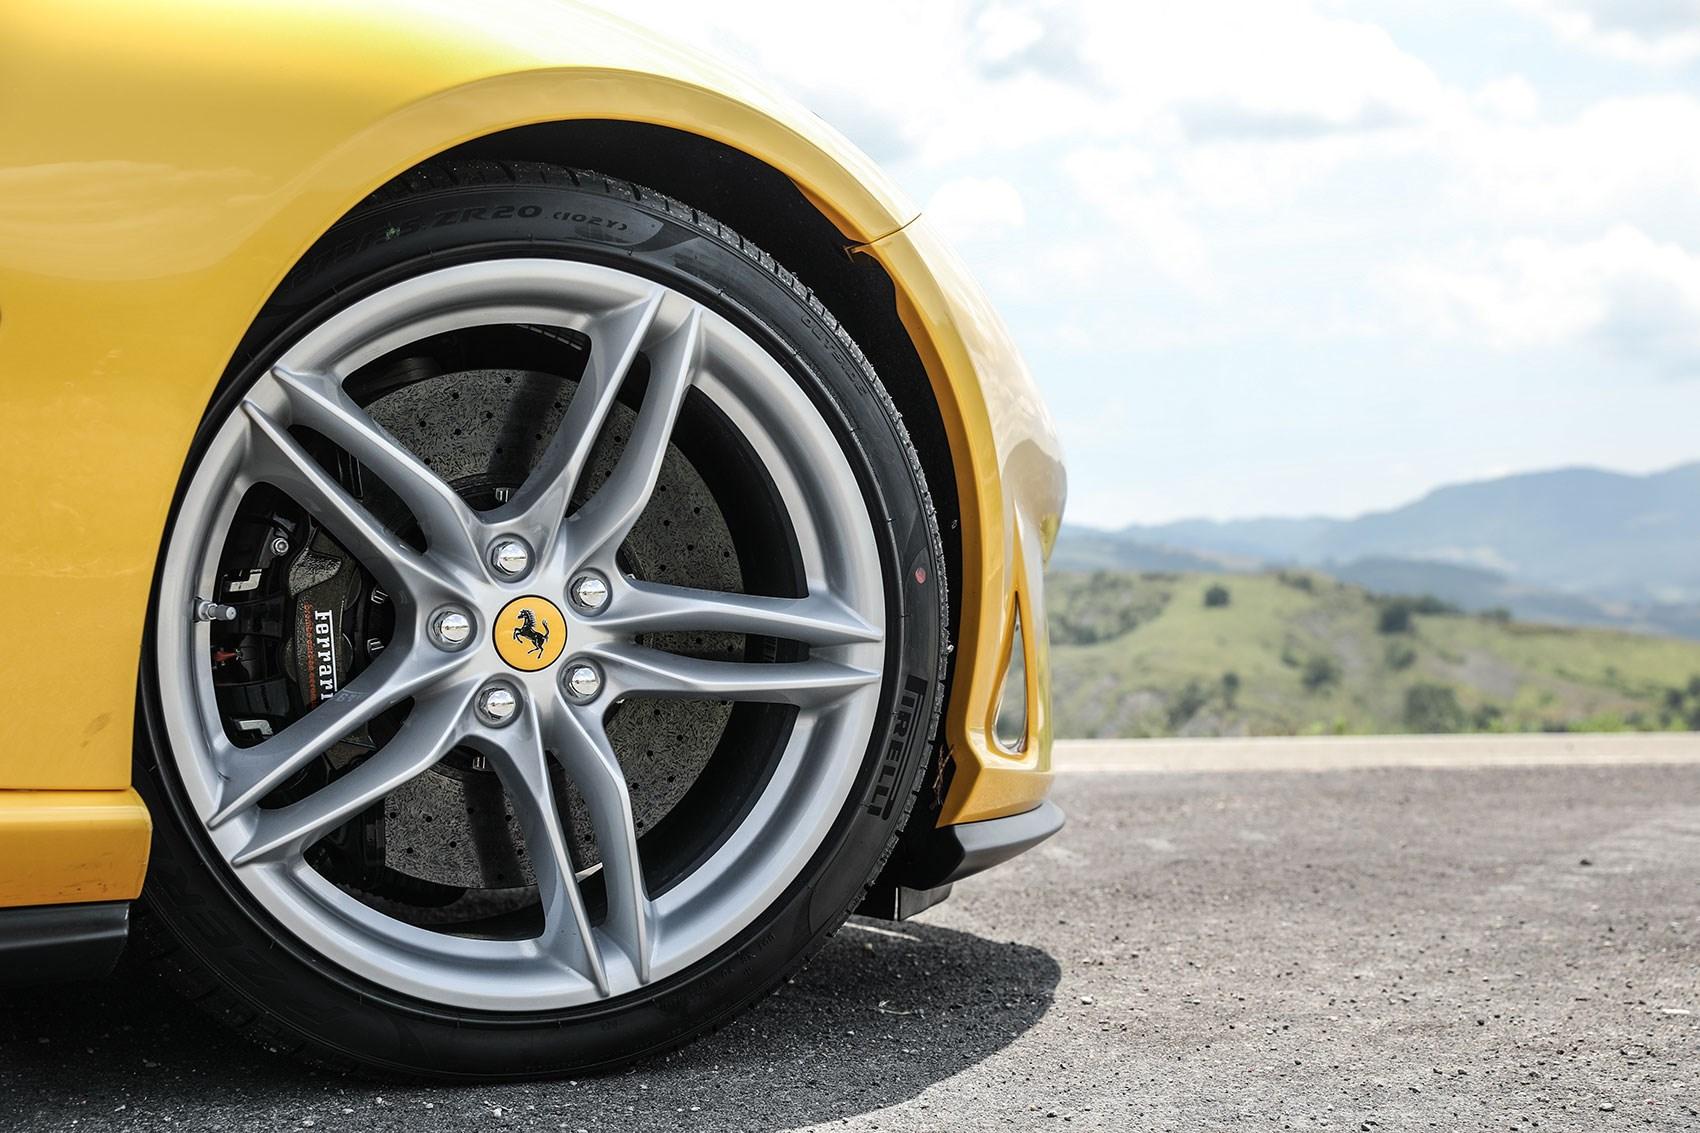 Ferrari 812 Superfast brakes